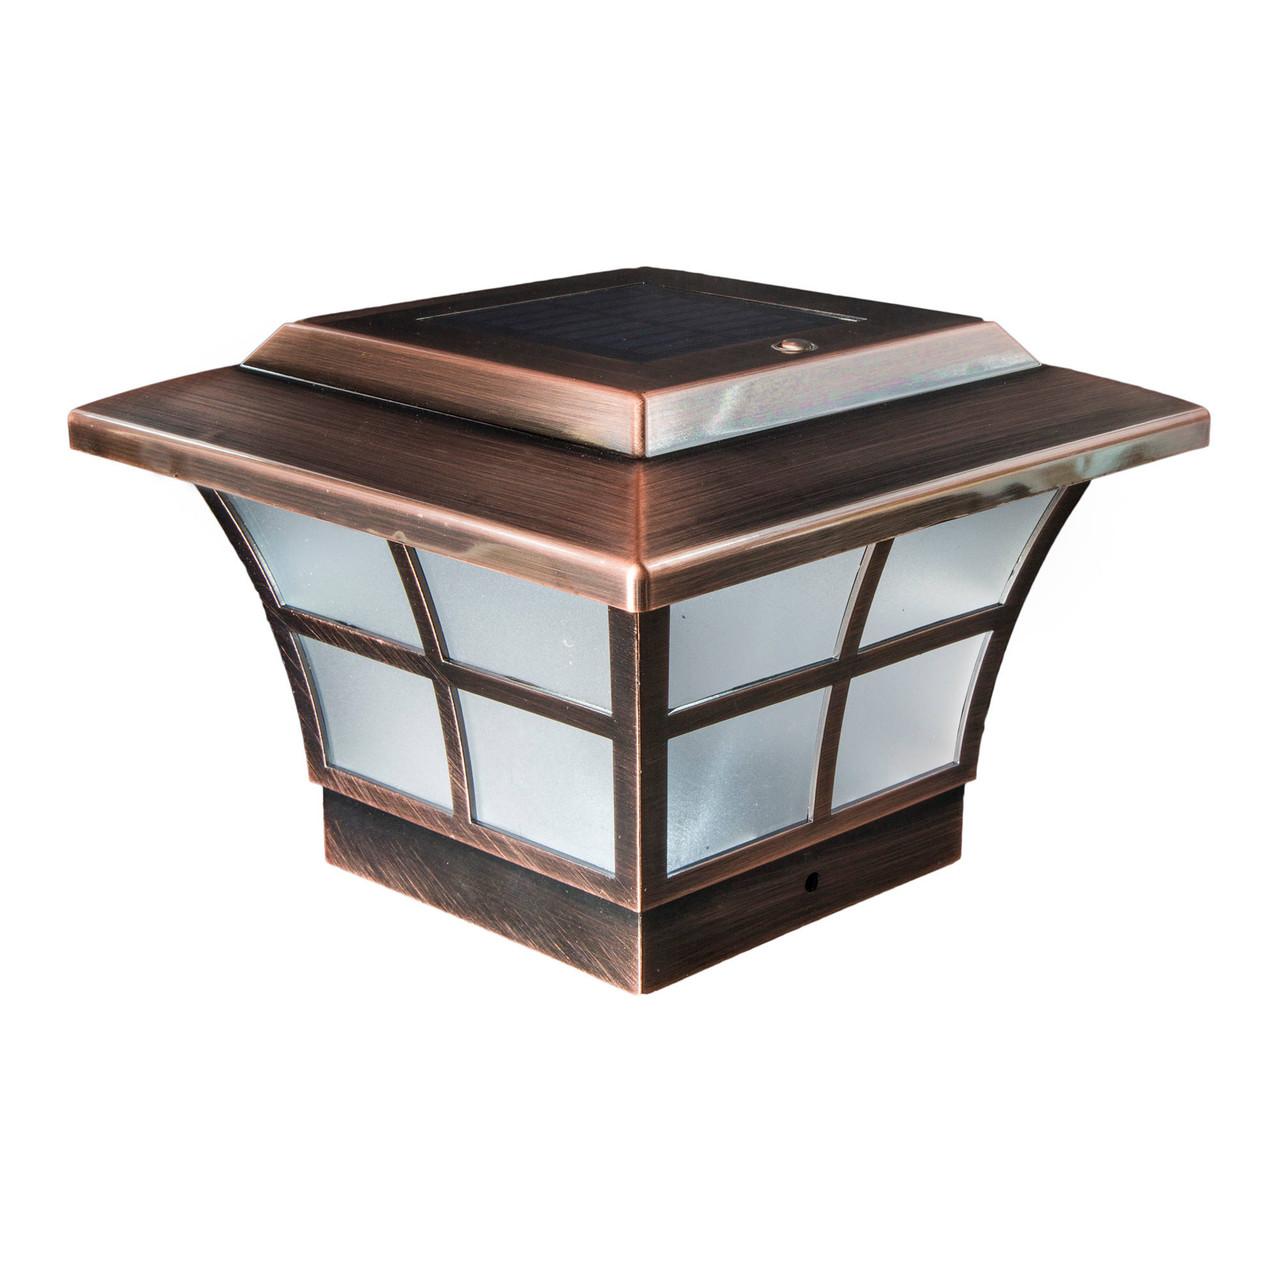 4x4 Copper Plated Prestige Solar Post Cap from Classy Caps (SLO79C)